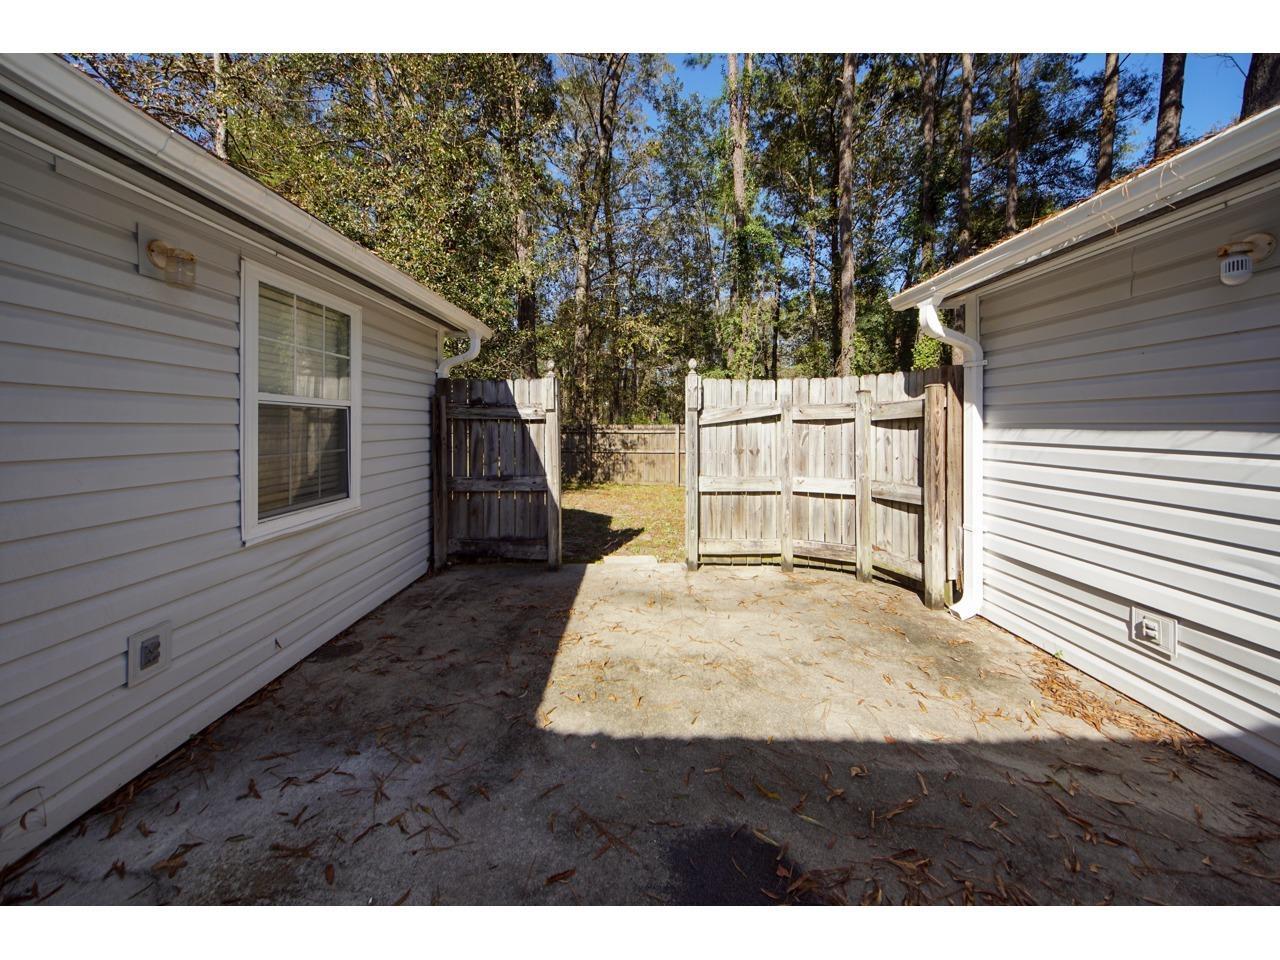 Crowfield Plantation Homes For Sale - 133 Shropshire, Goose Creek, SC - 9